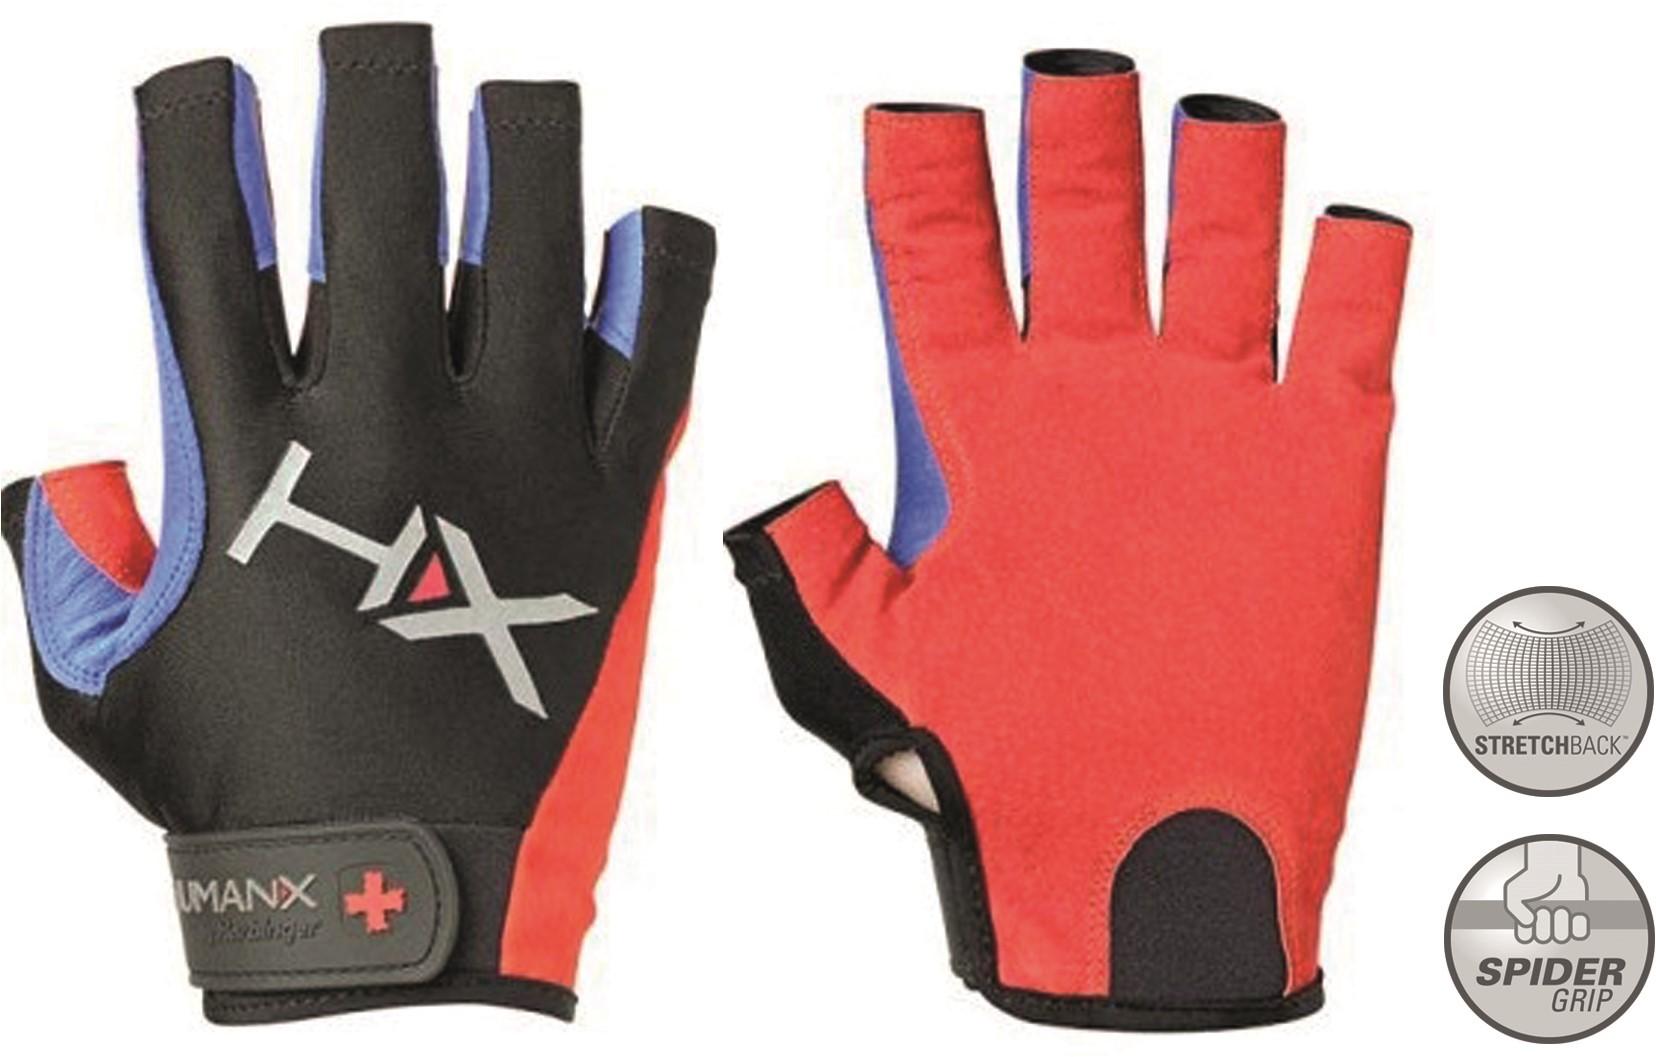 55d75653849 Harbinger Men's X3 Competition Open Finger Crossfit Fitness Handschoenen Red /Blue/Black